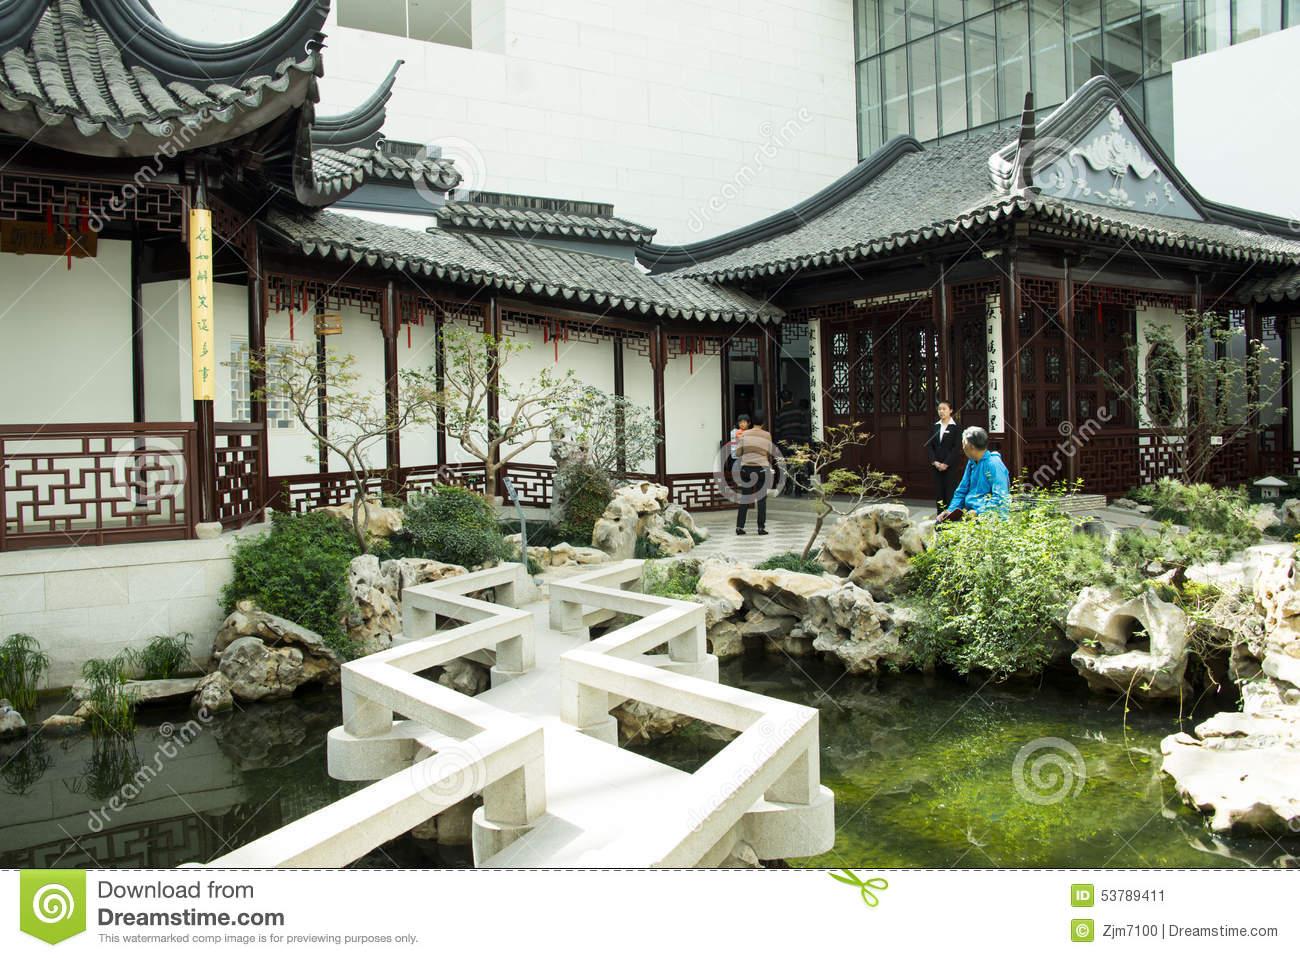 Asia Chinese, Beijing, China Garden Museum, Indoor Courtyard.